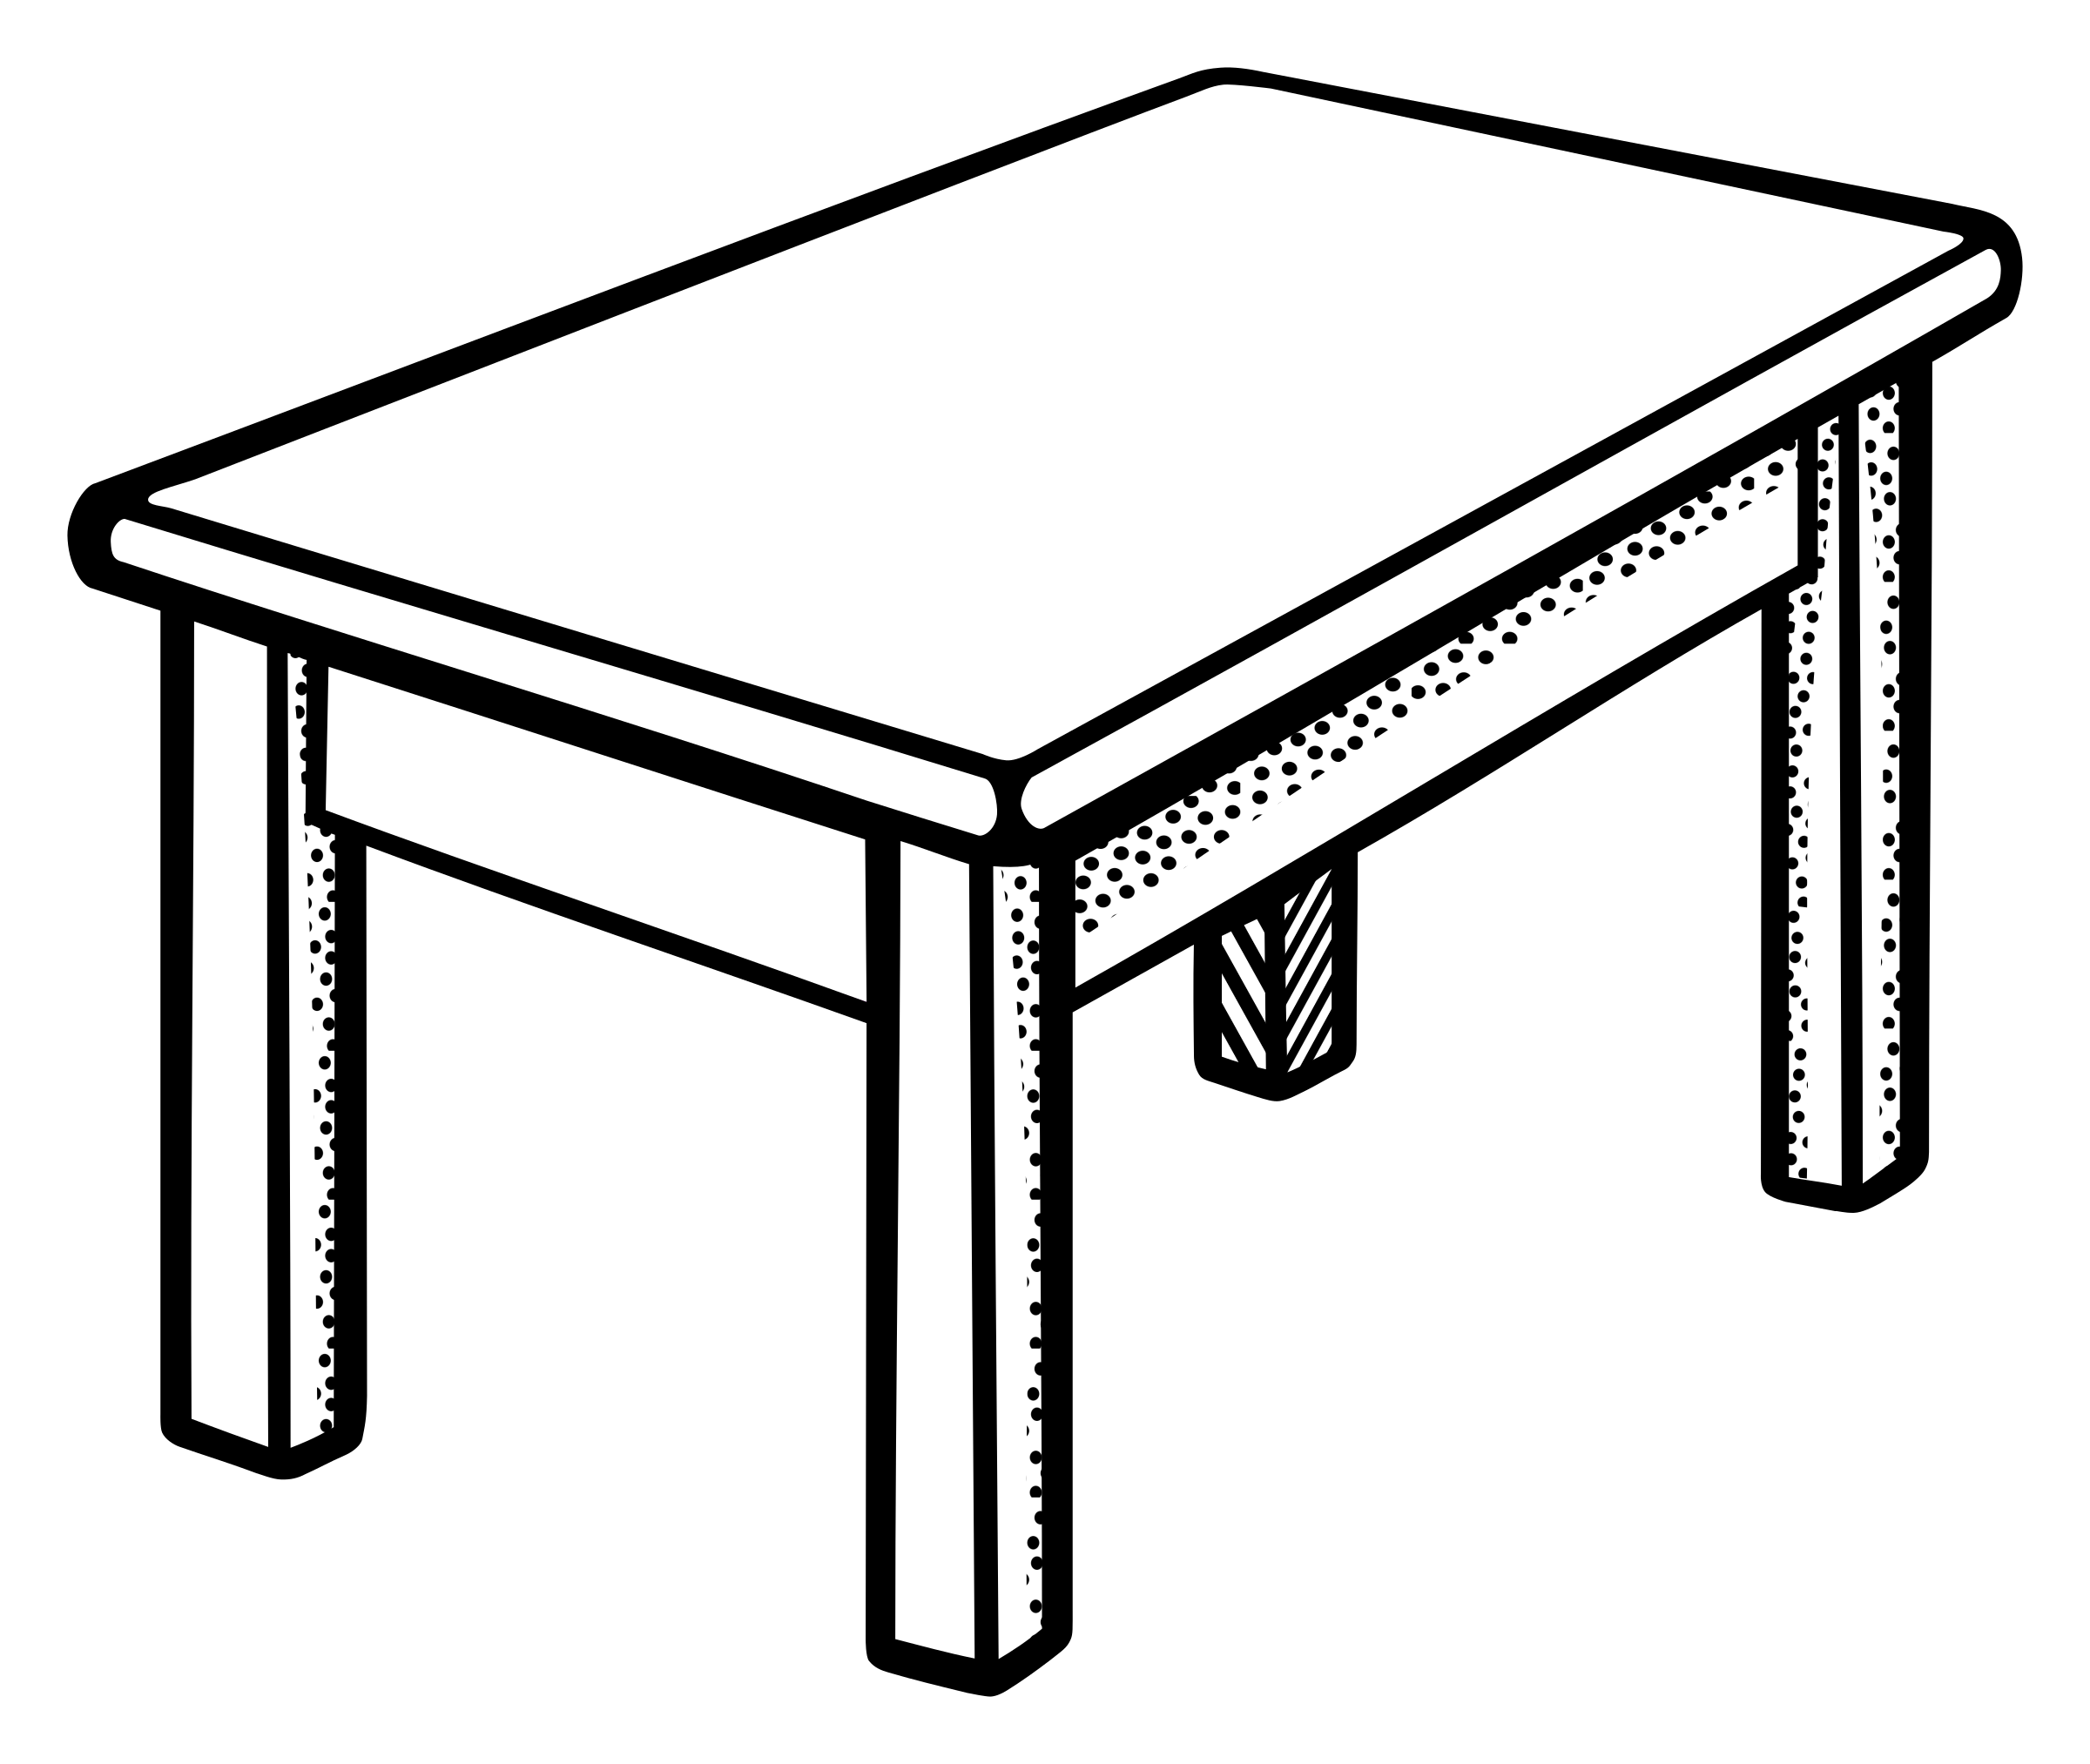 Clip Art Tables Clipartall-Clip art tables clipartall-3